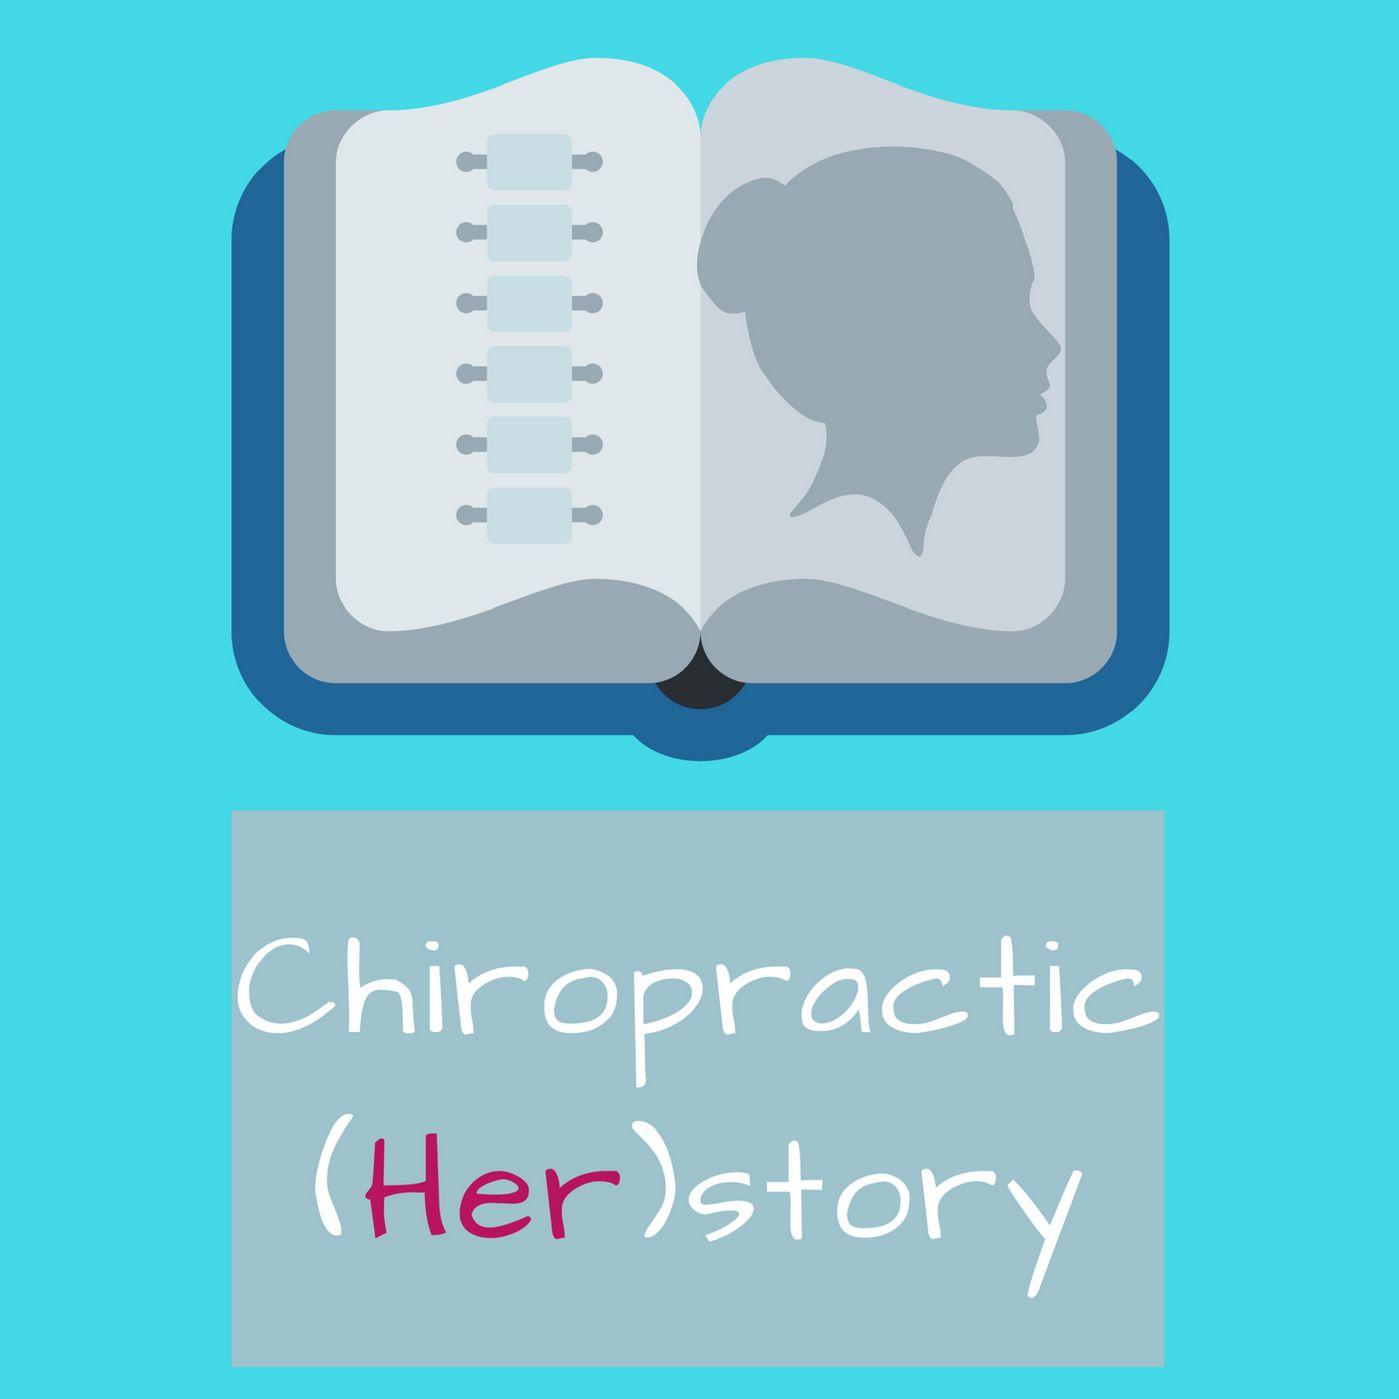 Dr. Devin Vrana- Chiropractic (Her)story Episode 55